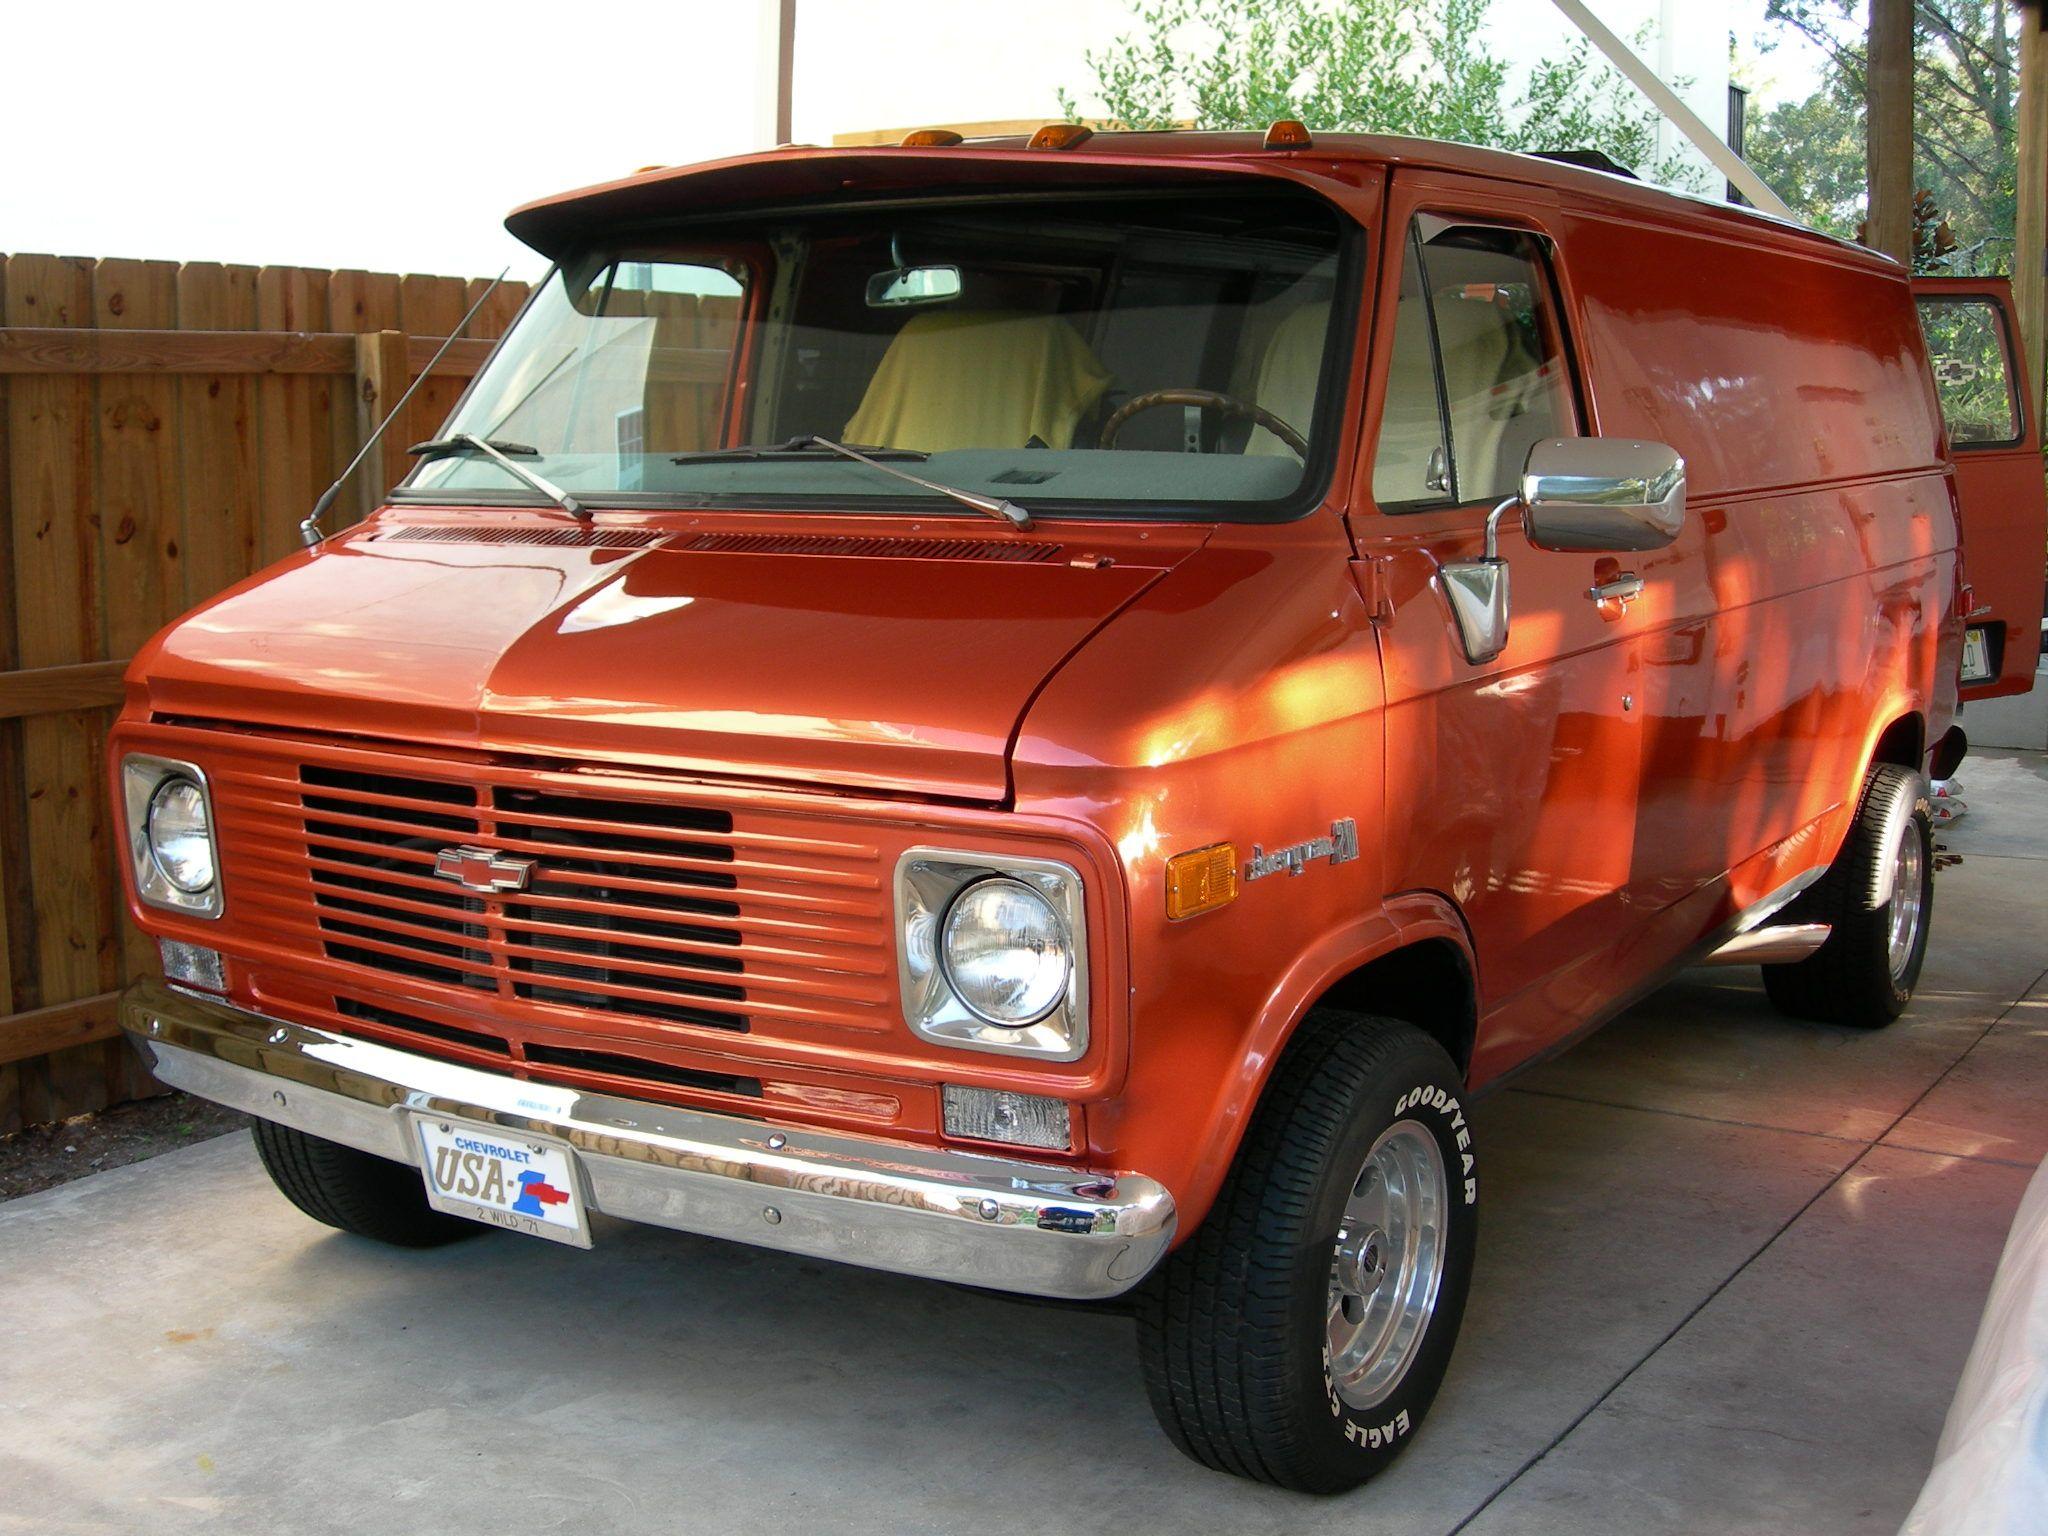 slick chevy vantastico fest pinterest vans custom vans and chevy vans. Black Bedroom Furniture Sets. Home Design Ideas